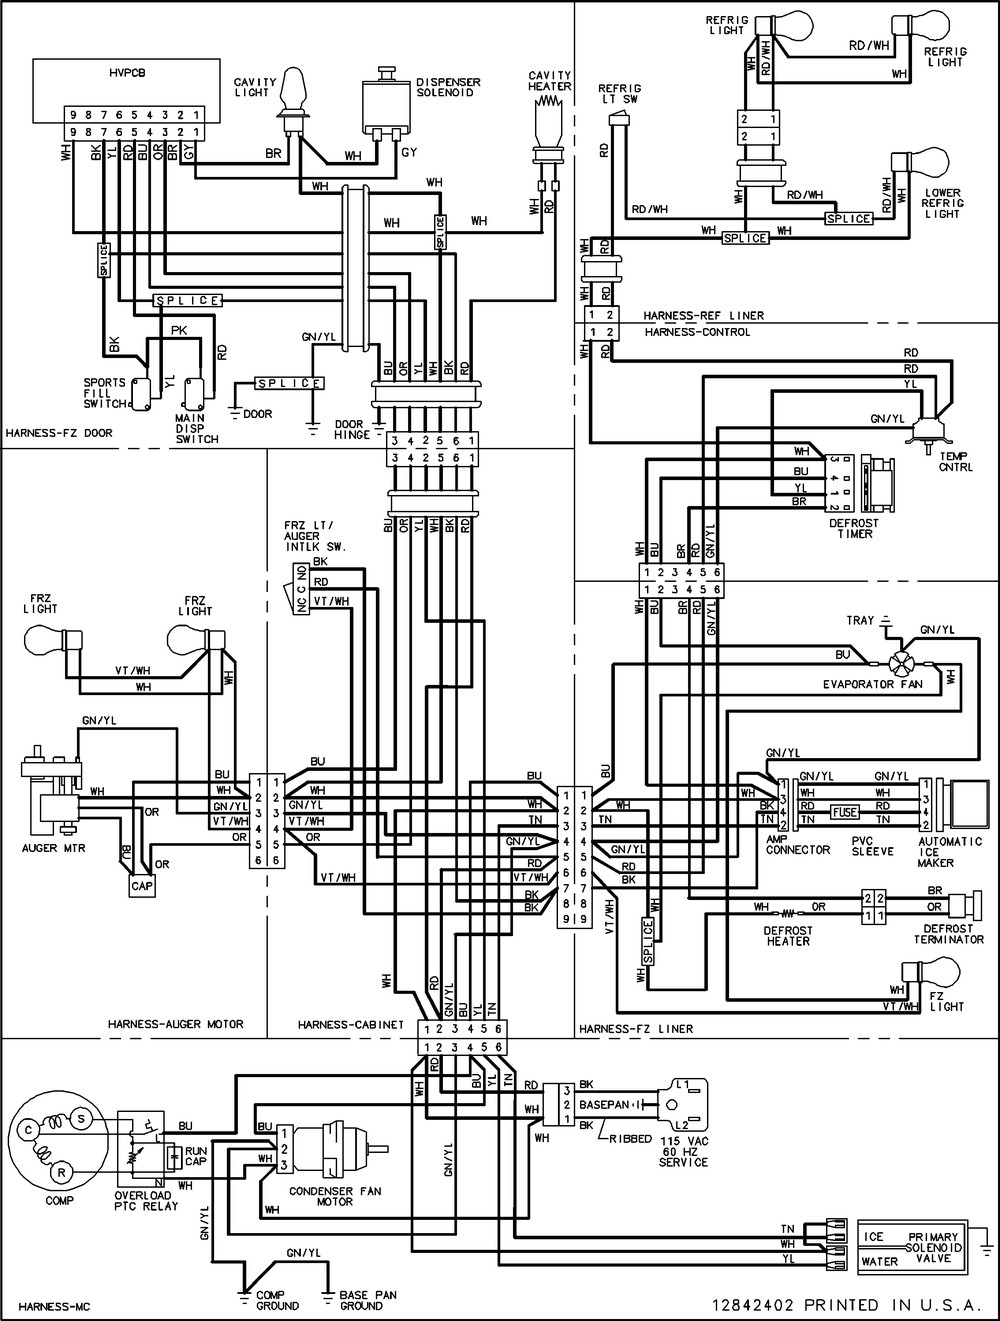 WRG-0325] Amanna Refrigerator Wiring Diagrammayatopcollections-070822.mx.tl